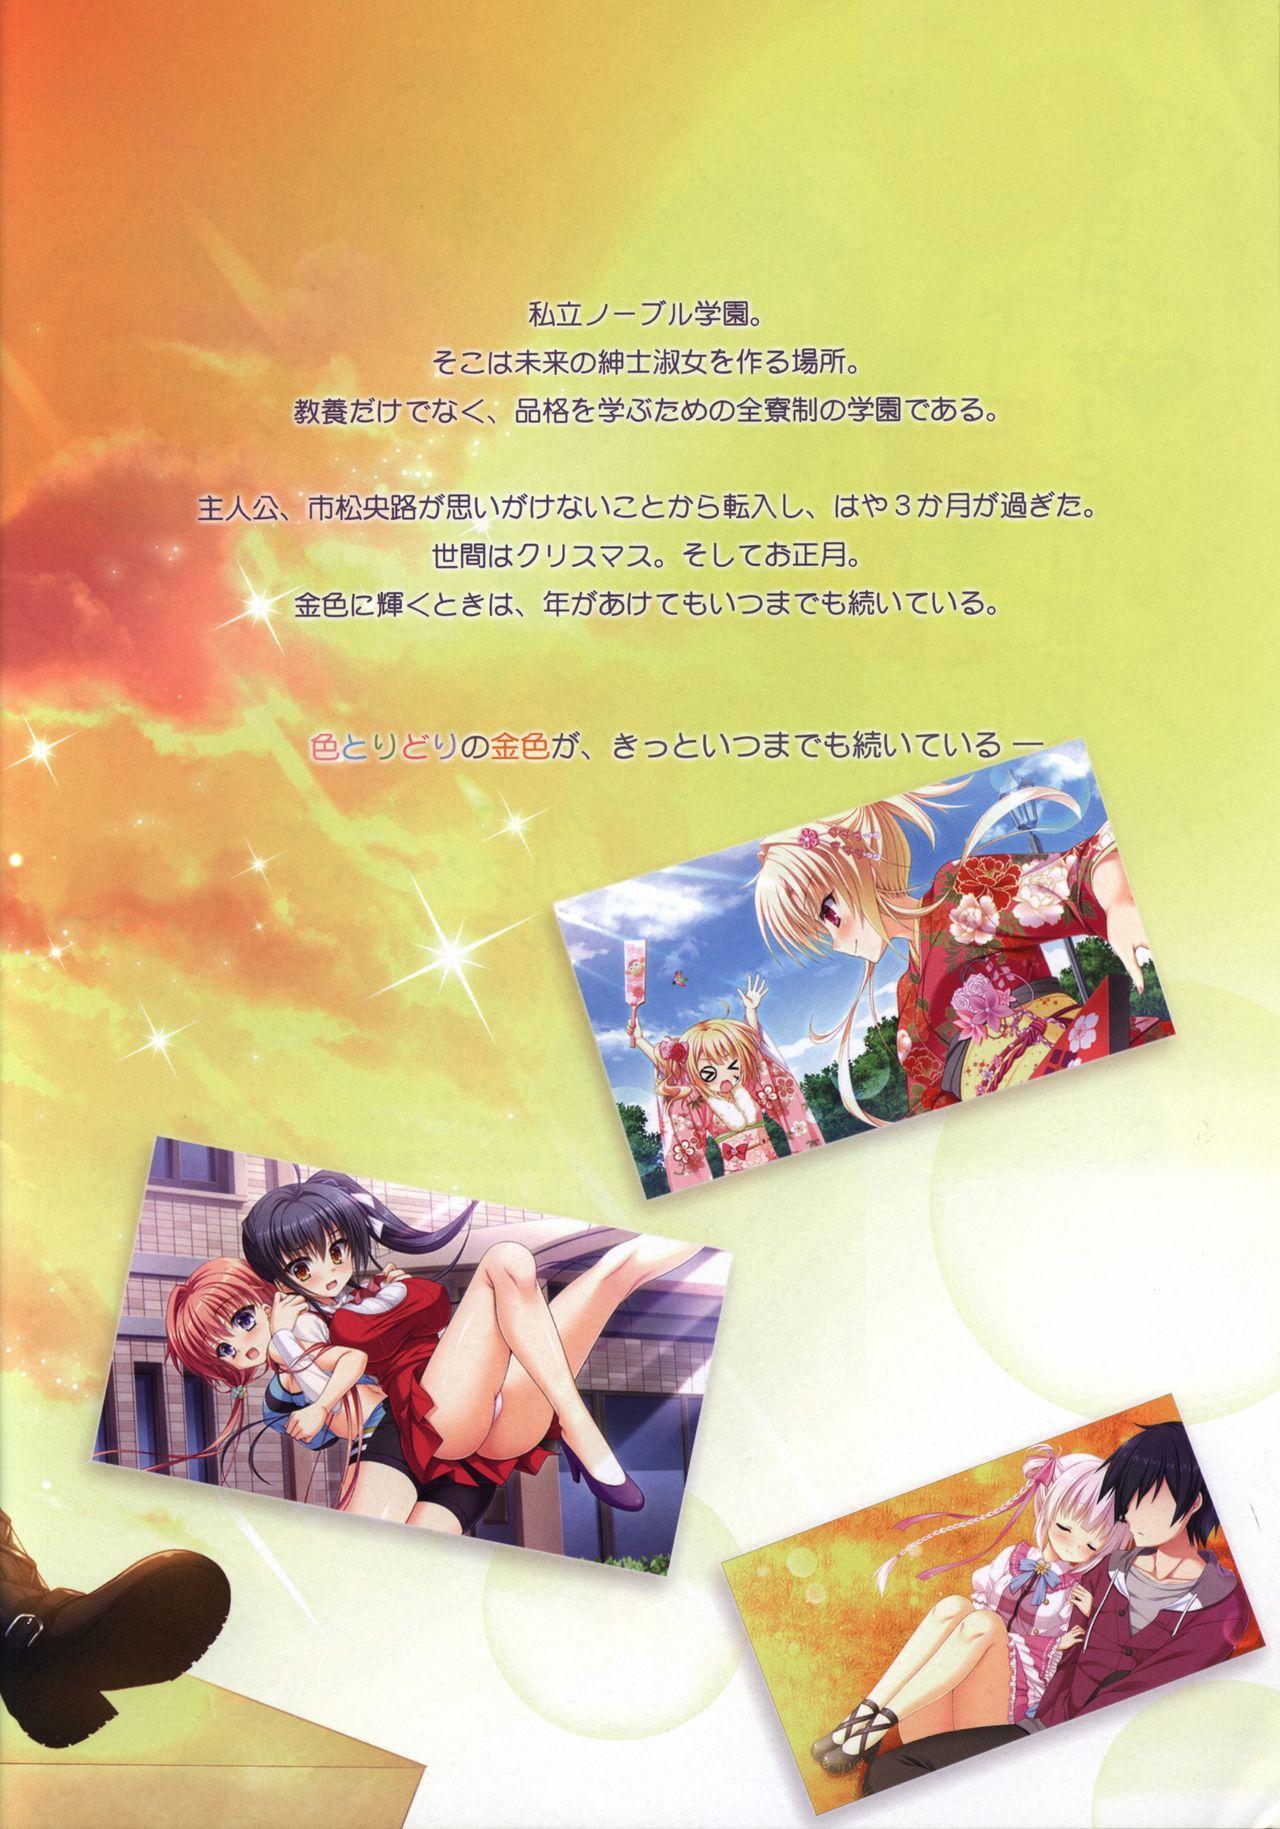 Kiniro Loveriche-Golden Time- full color book 1